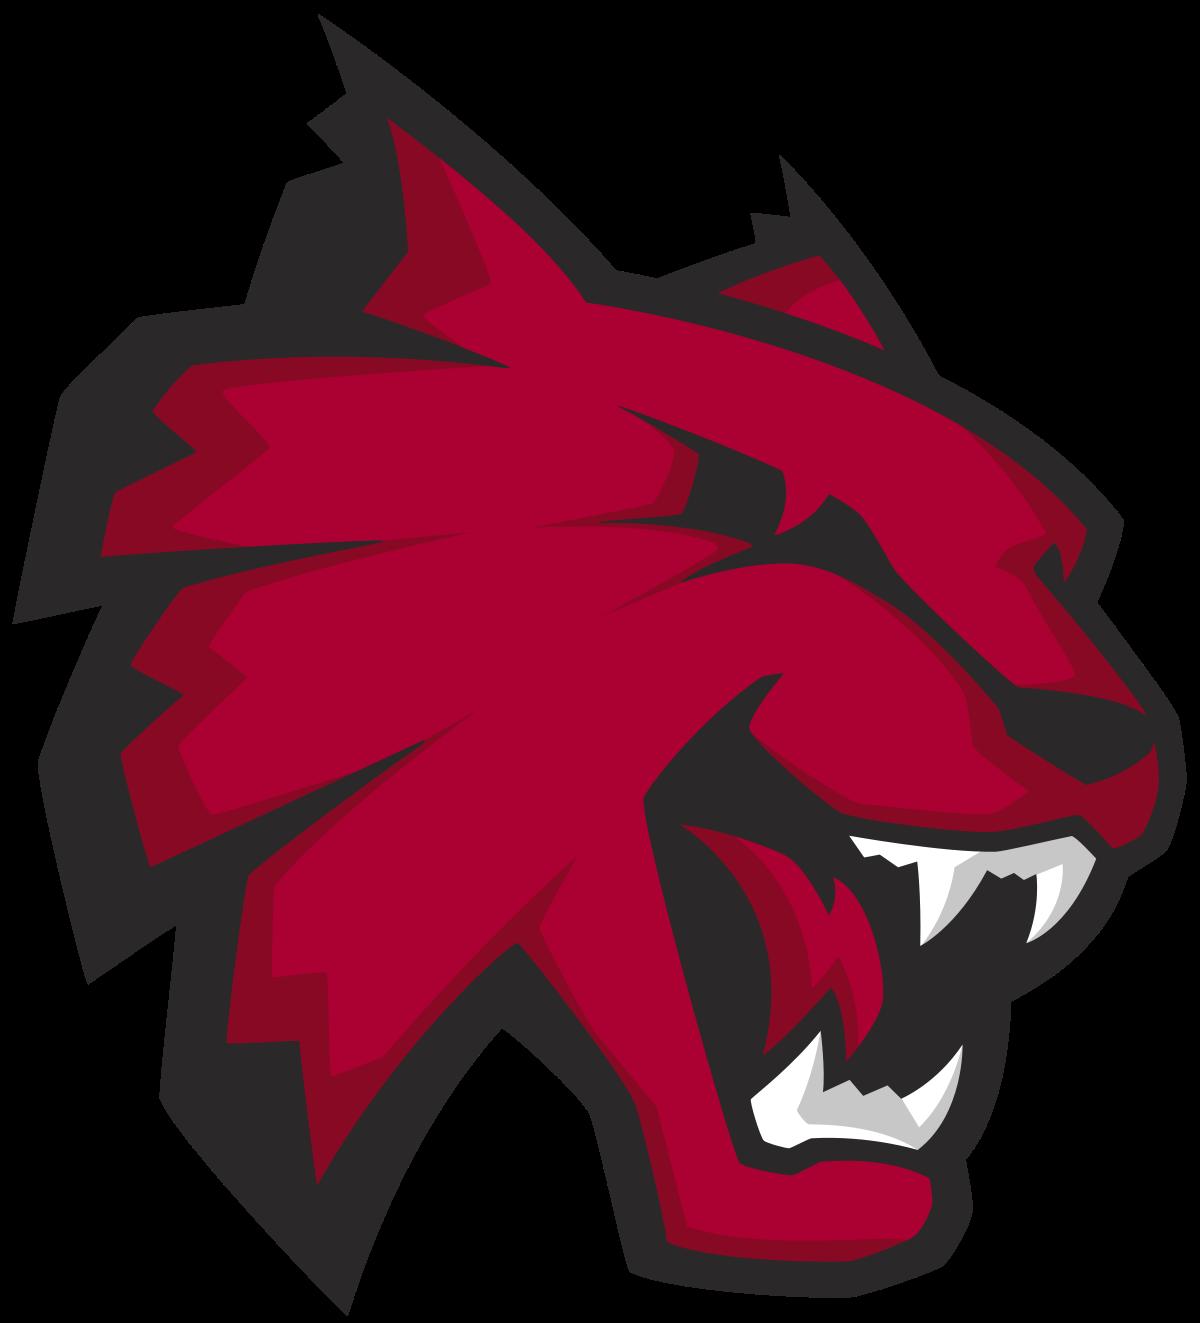 University of washington mascot clipart jpg Central Washington Wildcats - Wikipedia jpg